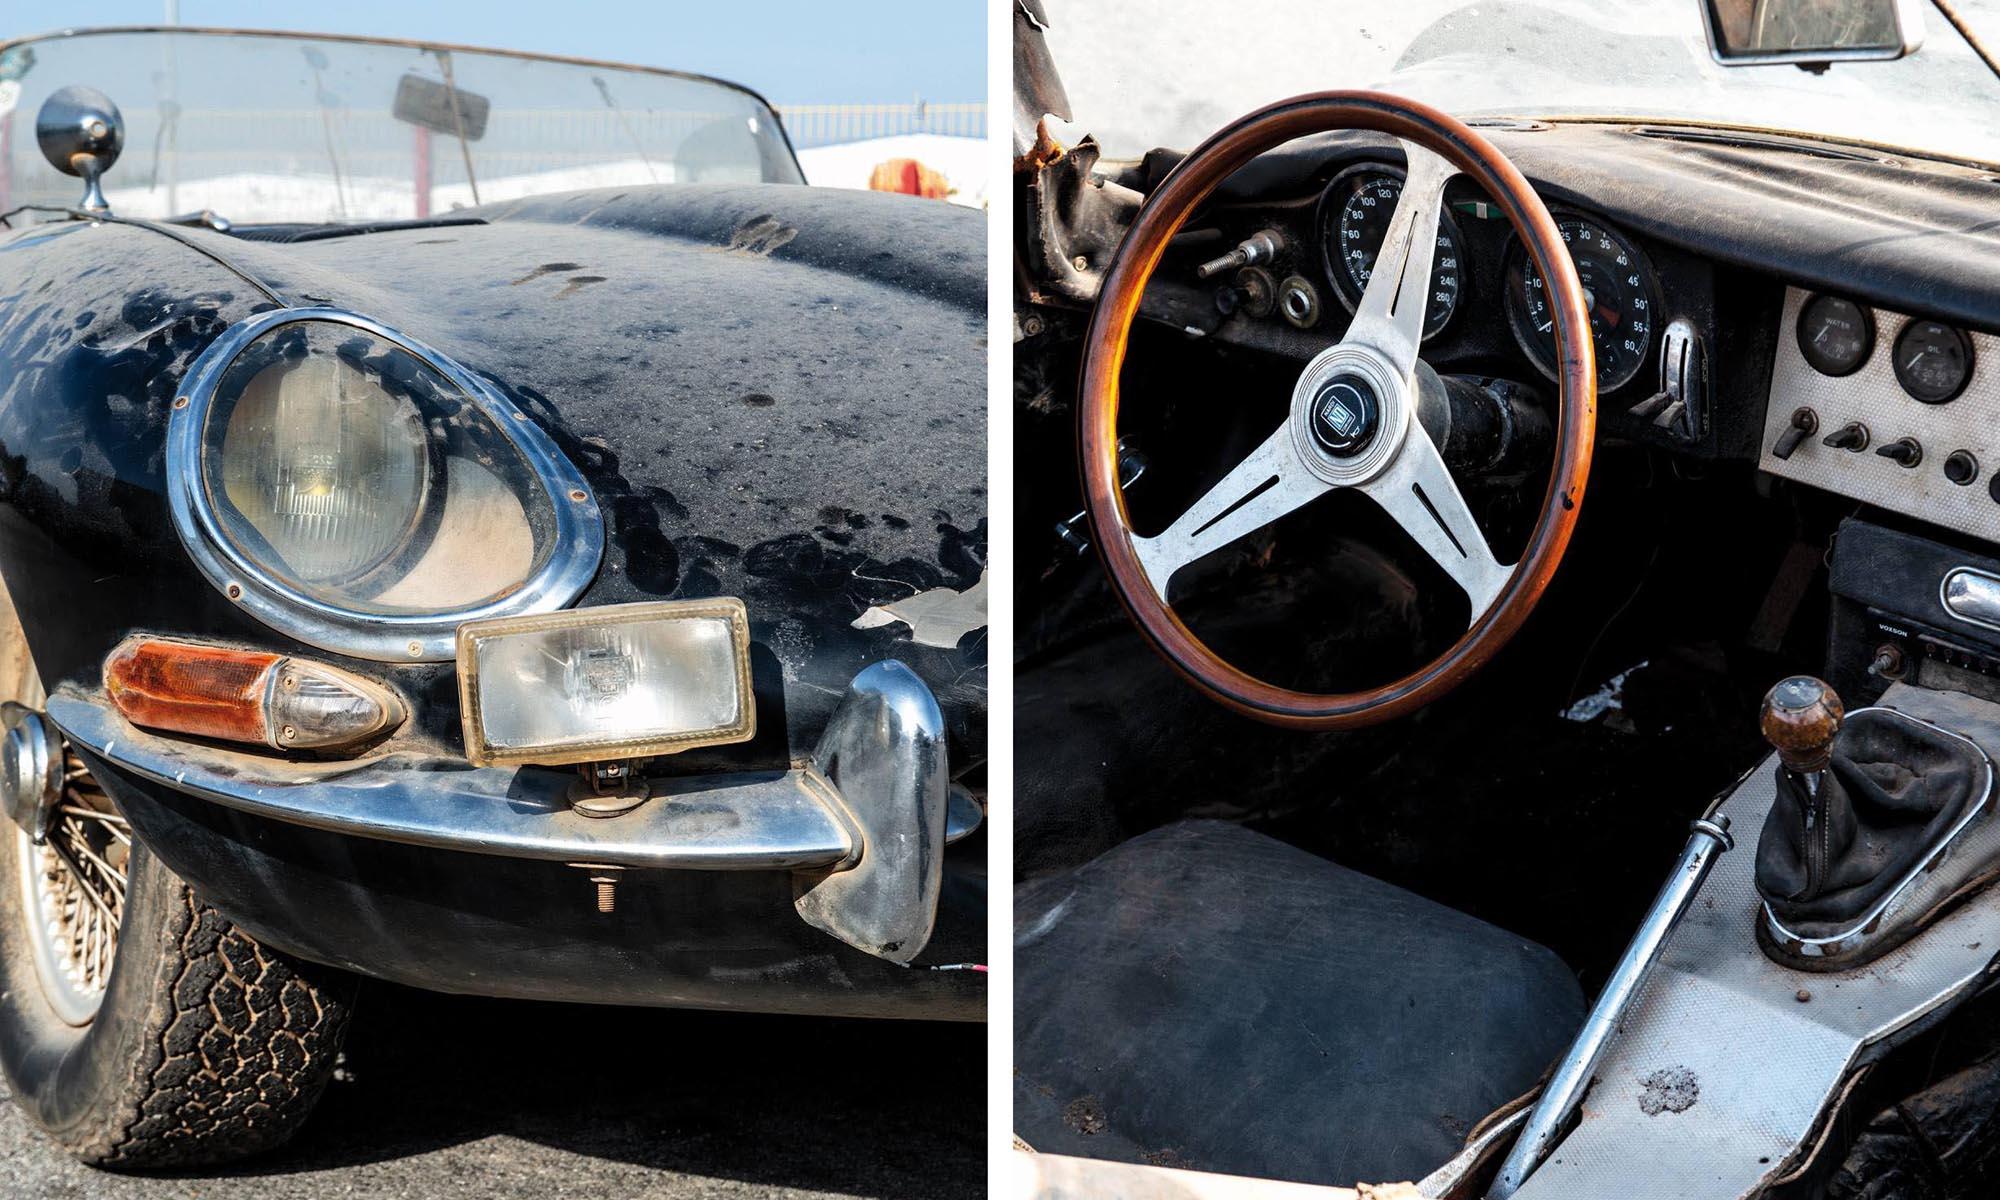 Jaguar, E-Type, car, sport car, vehicle, job, travel, Africa, auction, veteran, businessman, tale, France